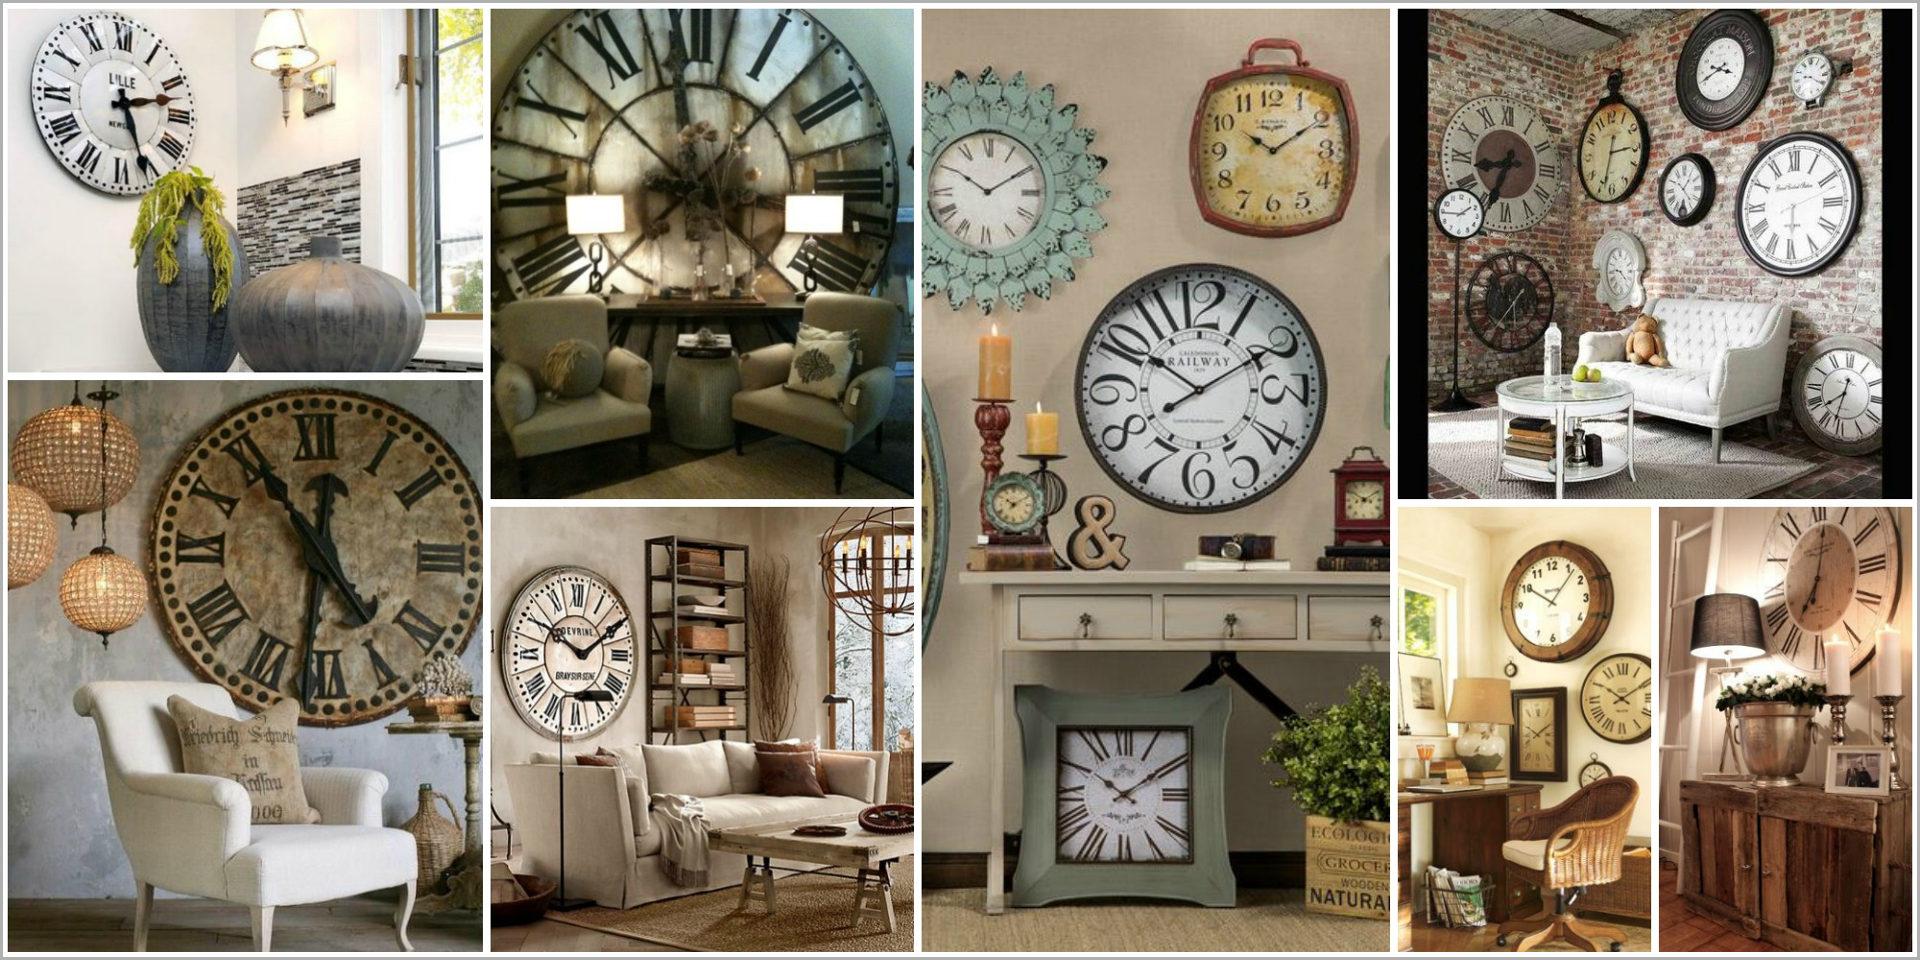 Dining Room Living Room Wall Clock Decor Ideas Novocom Top